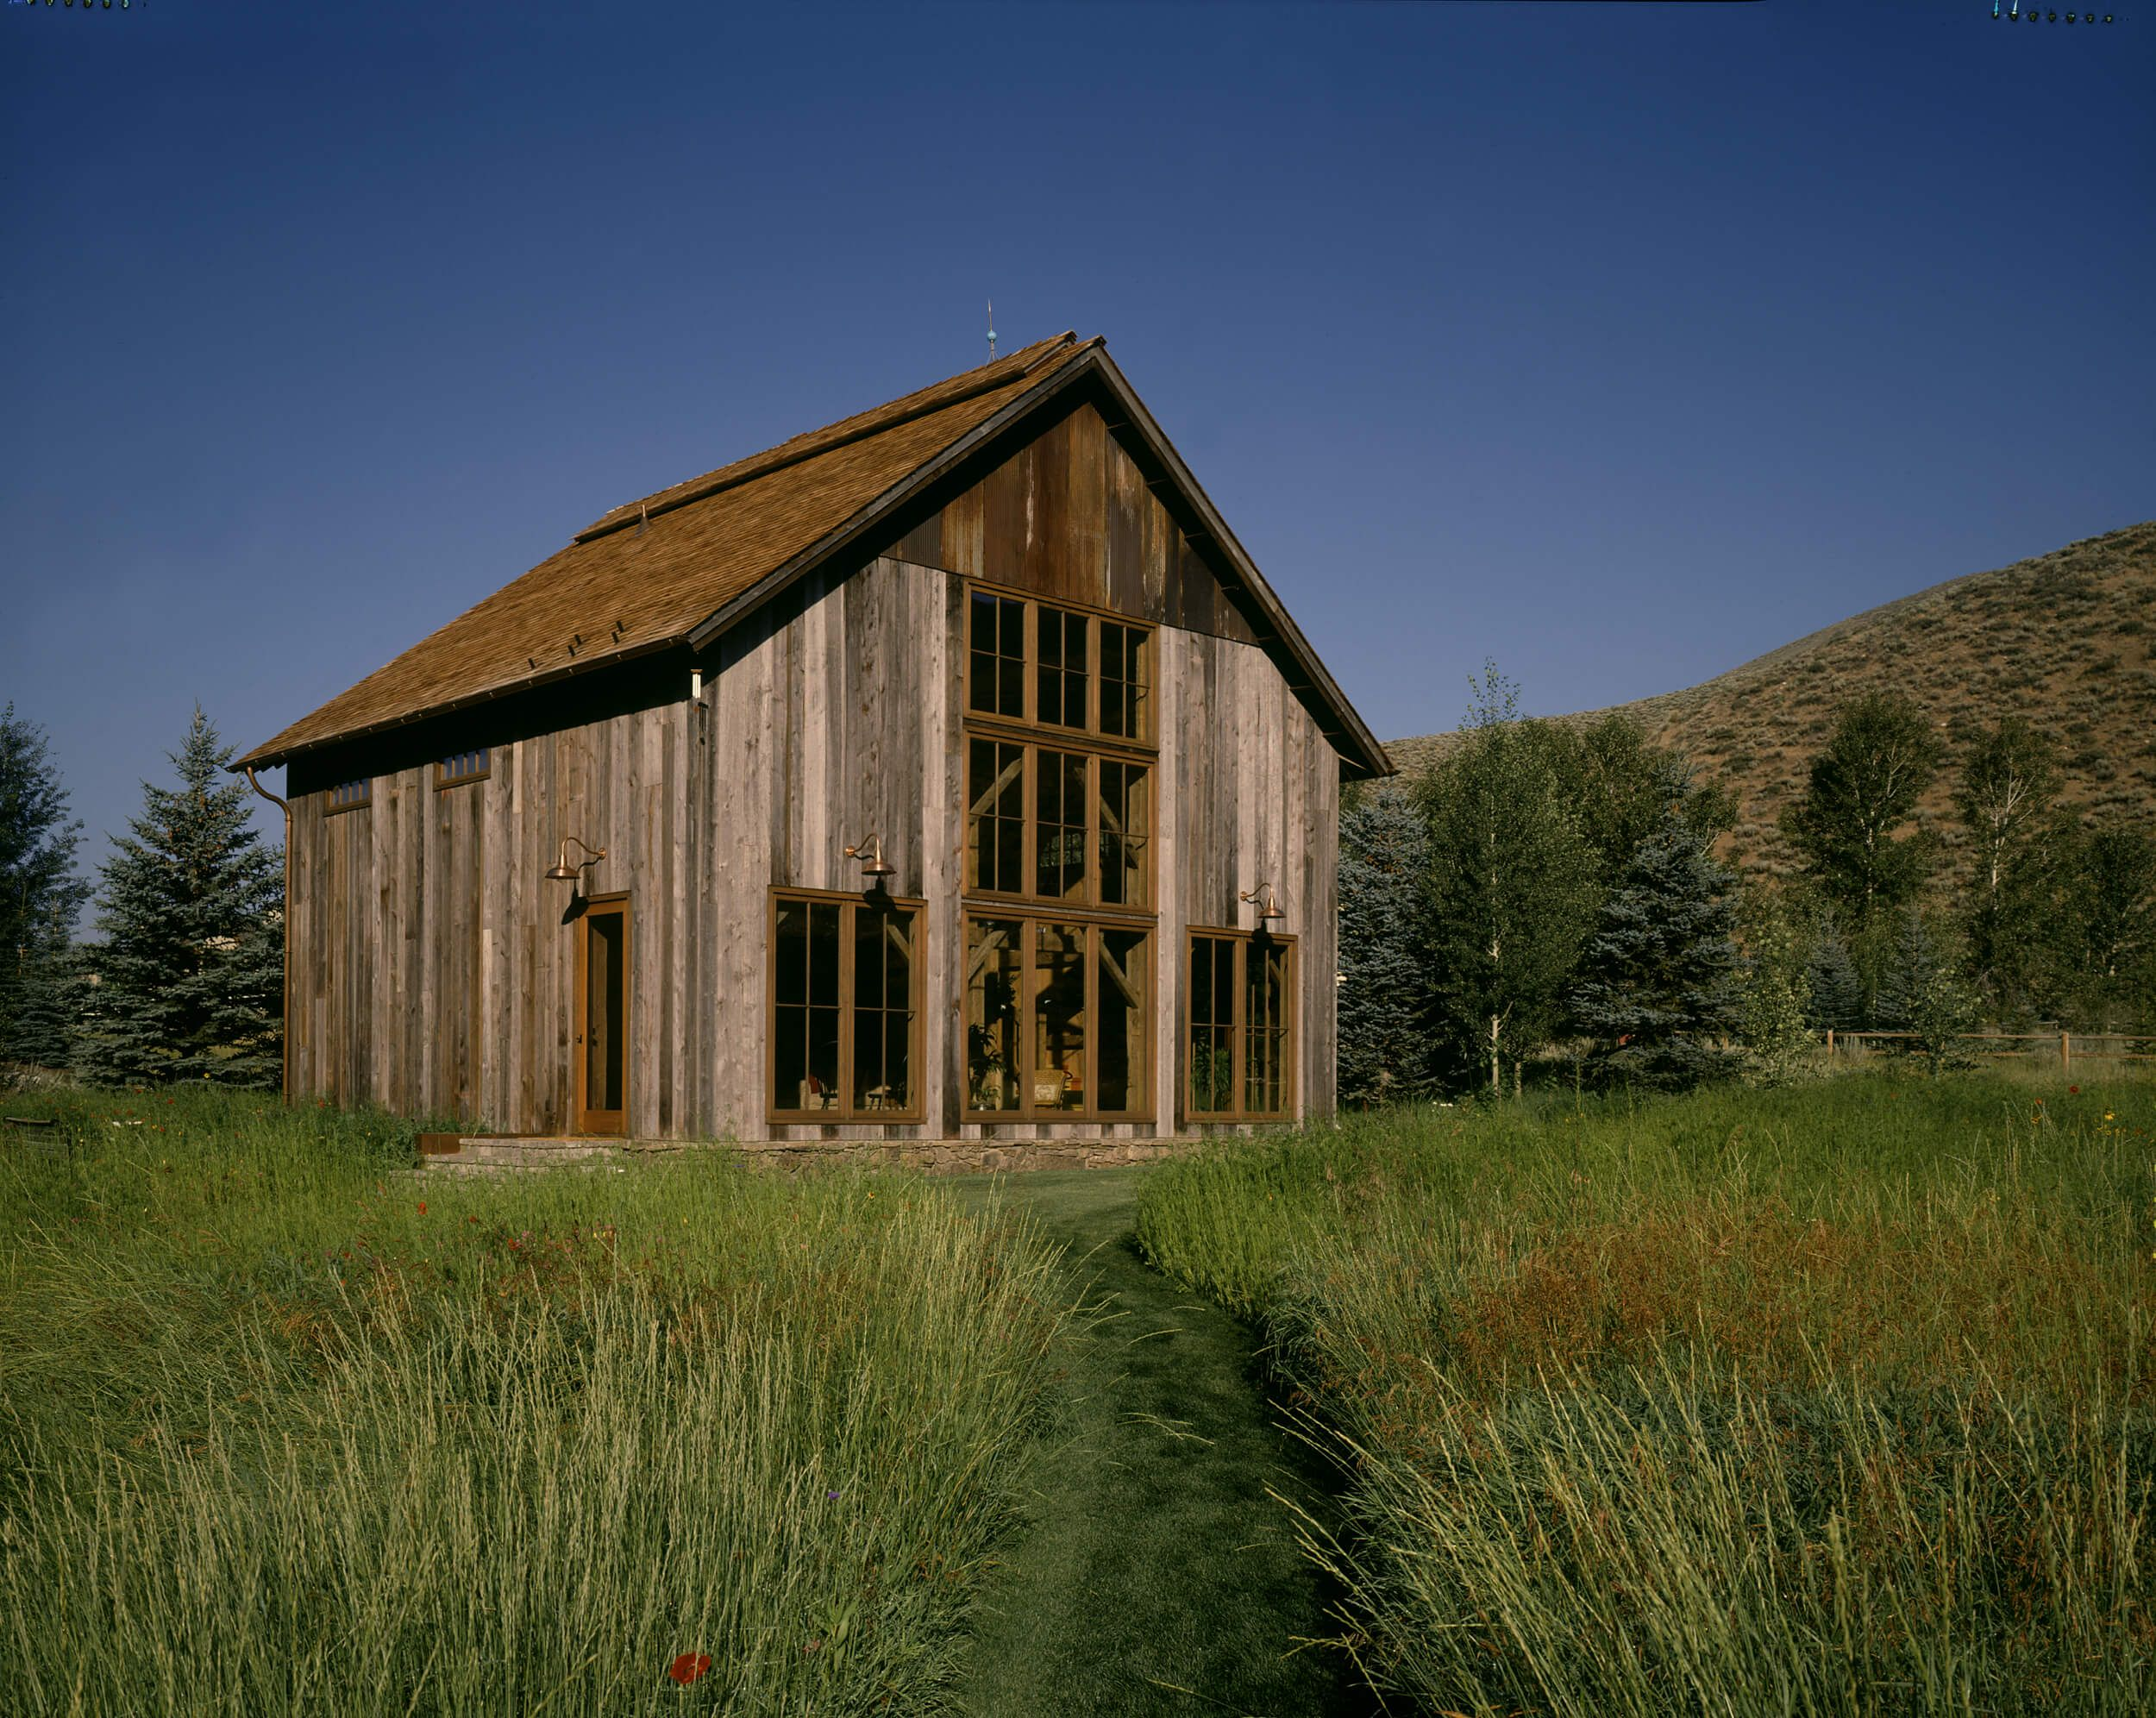 Vintage timber frame barn addition farmhouse exterior burlington - Our 24 X 30 One Story Barn Www Countrycarpenters Com One Story Barns 24 Deep Pinterest Barn Garage Loft And Loft Ideas